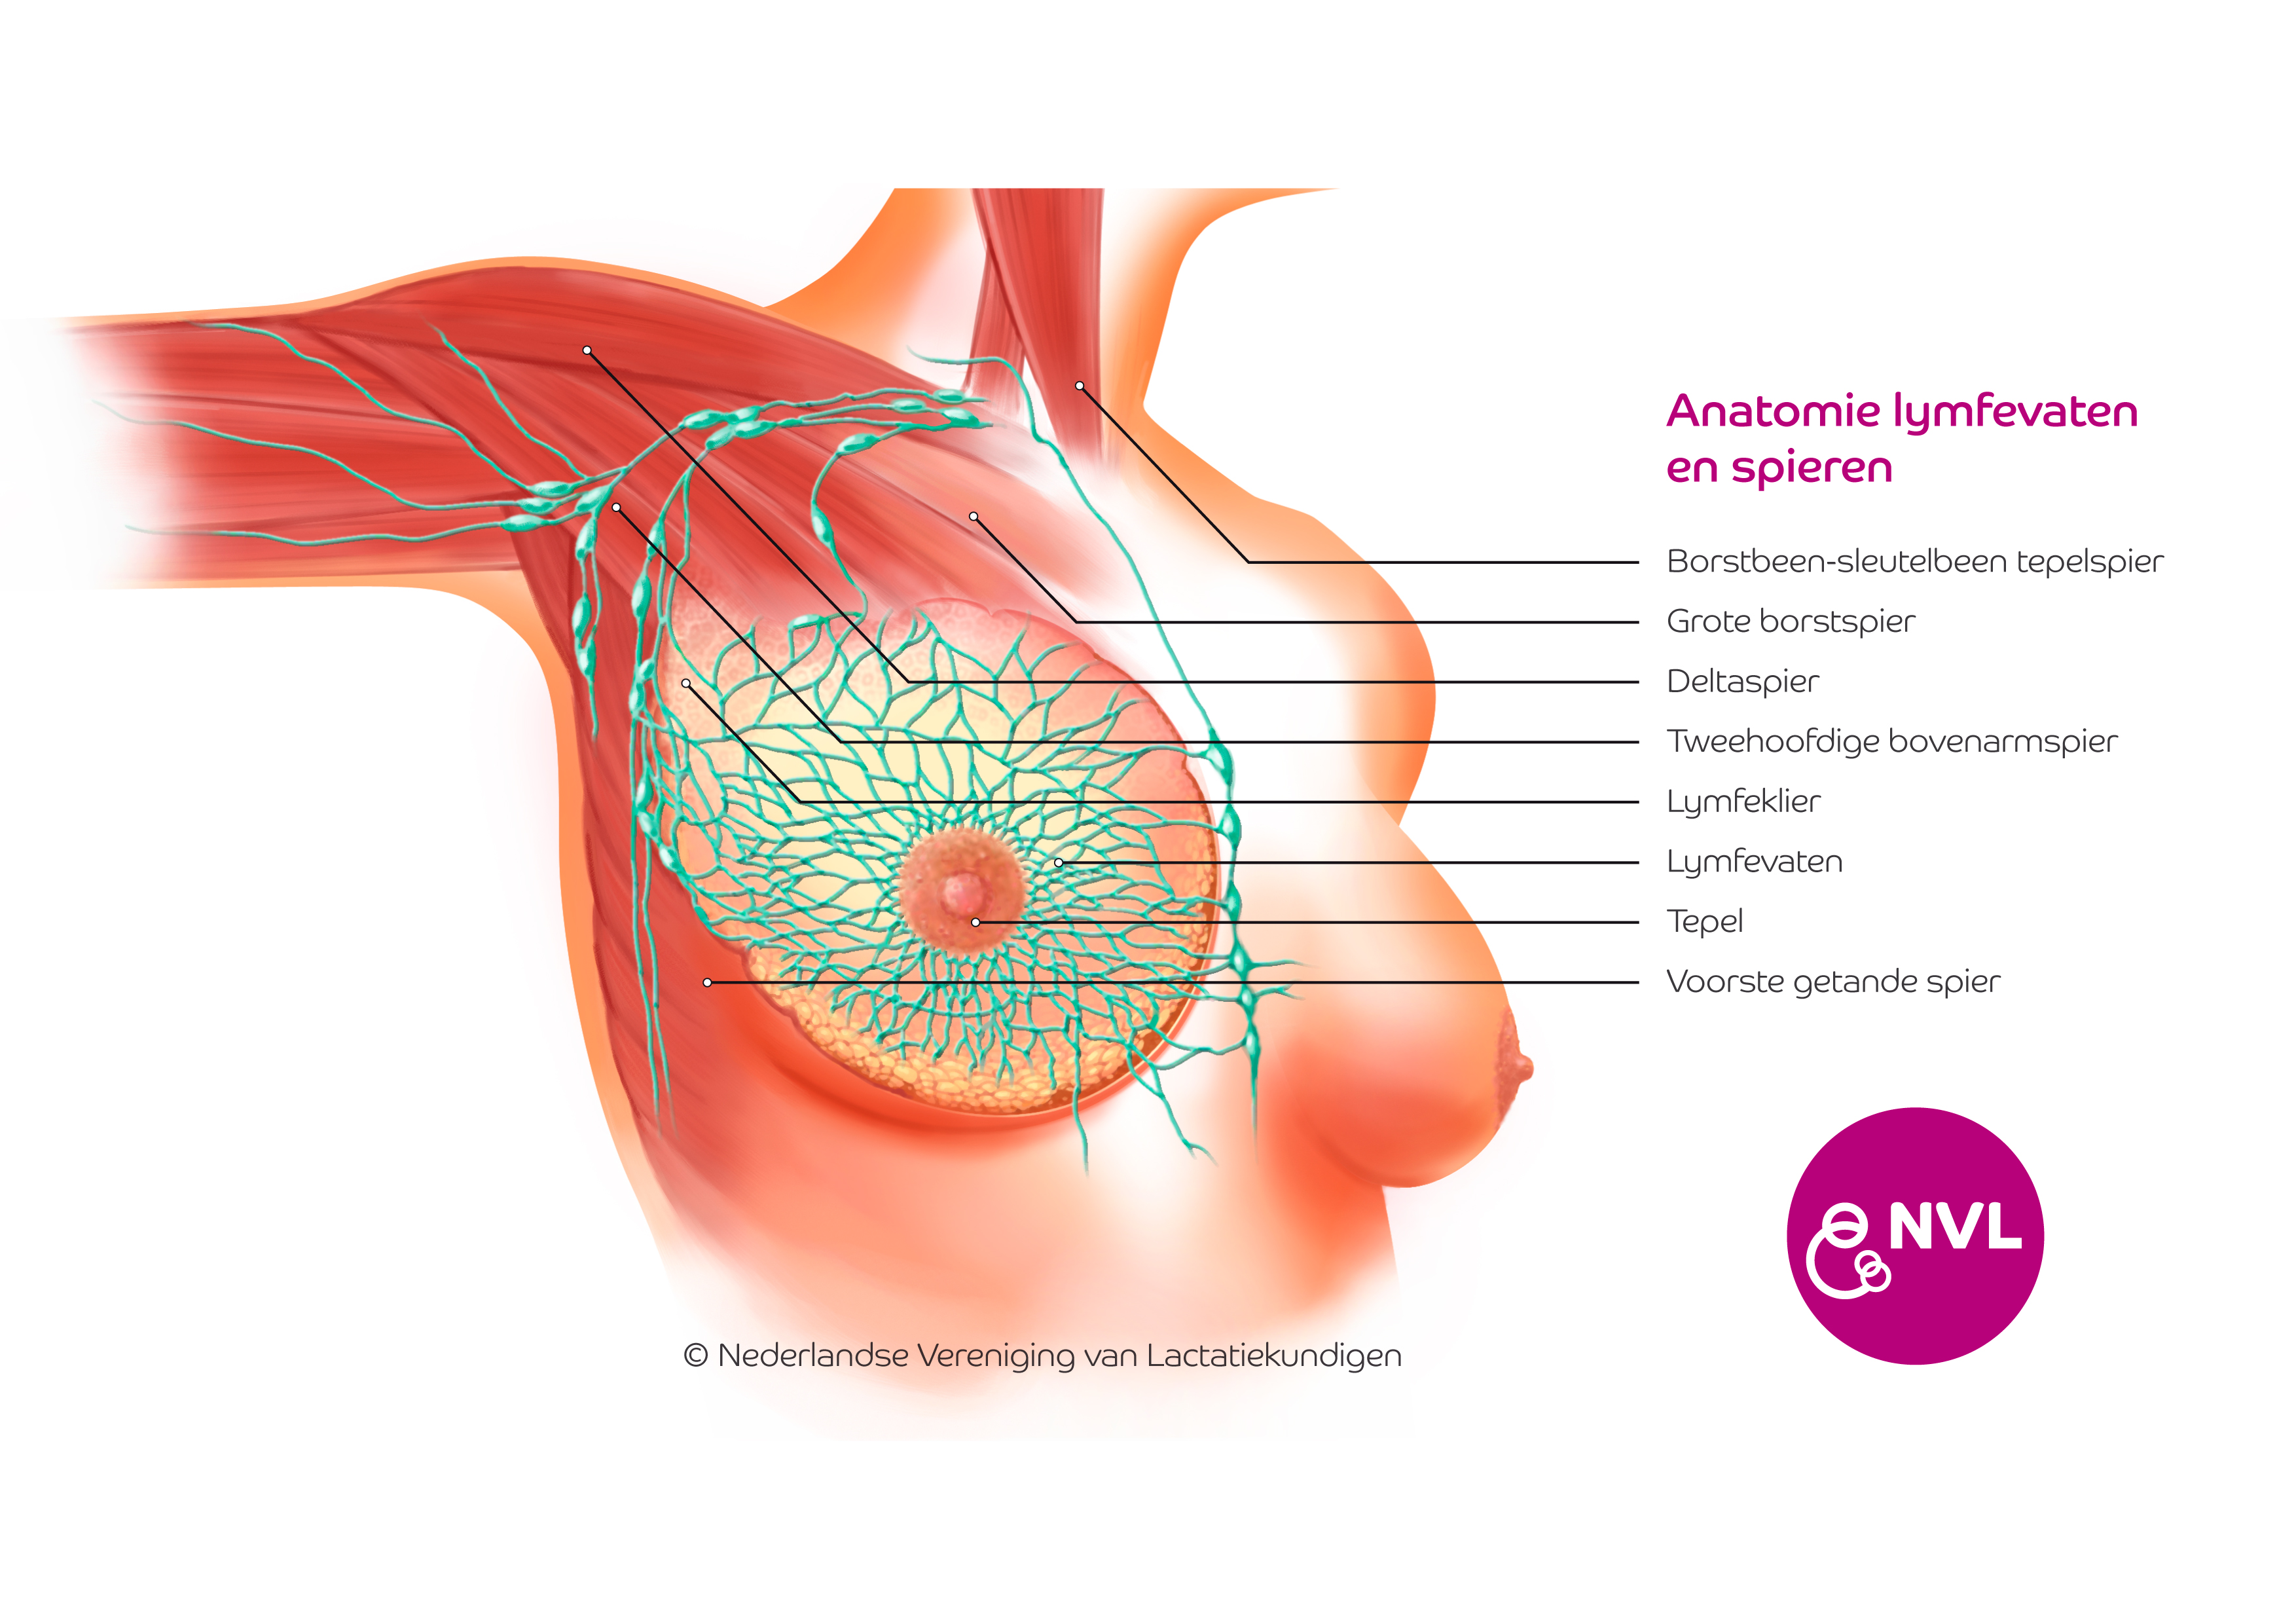 Lymfevaten En Spieren Borst